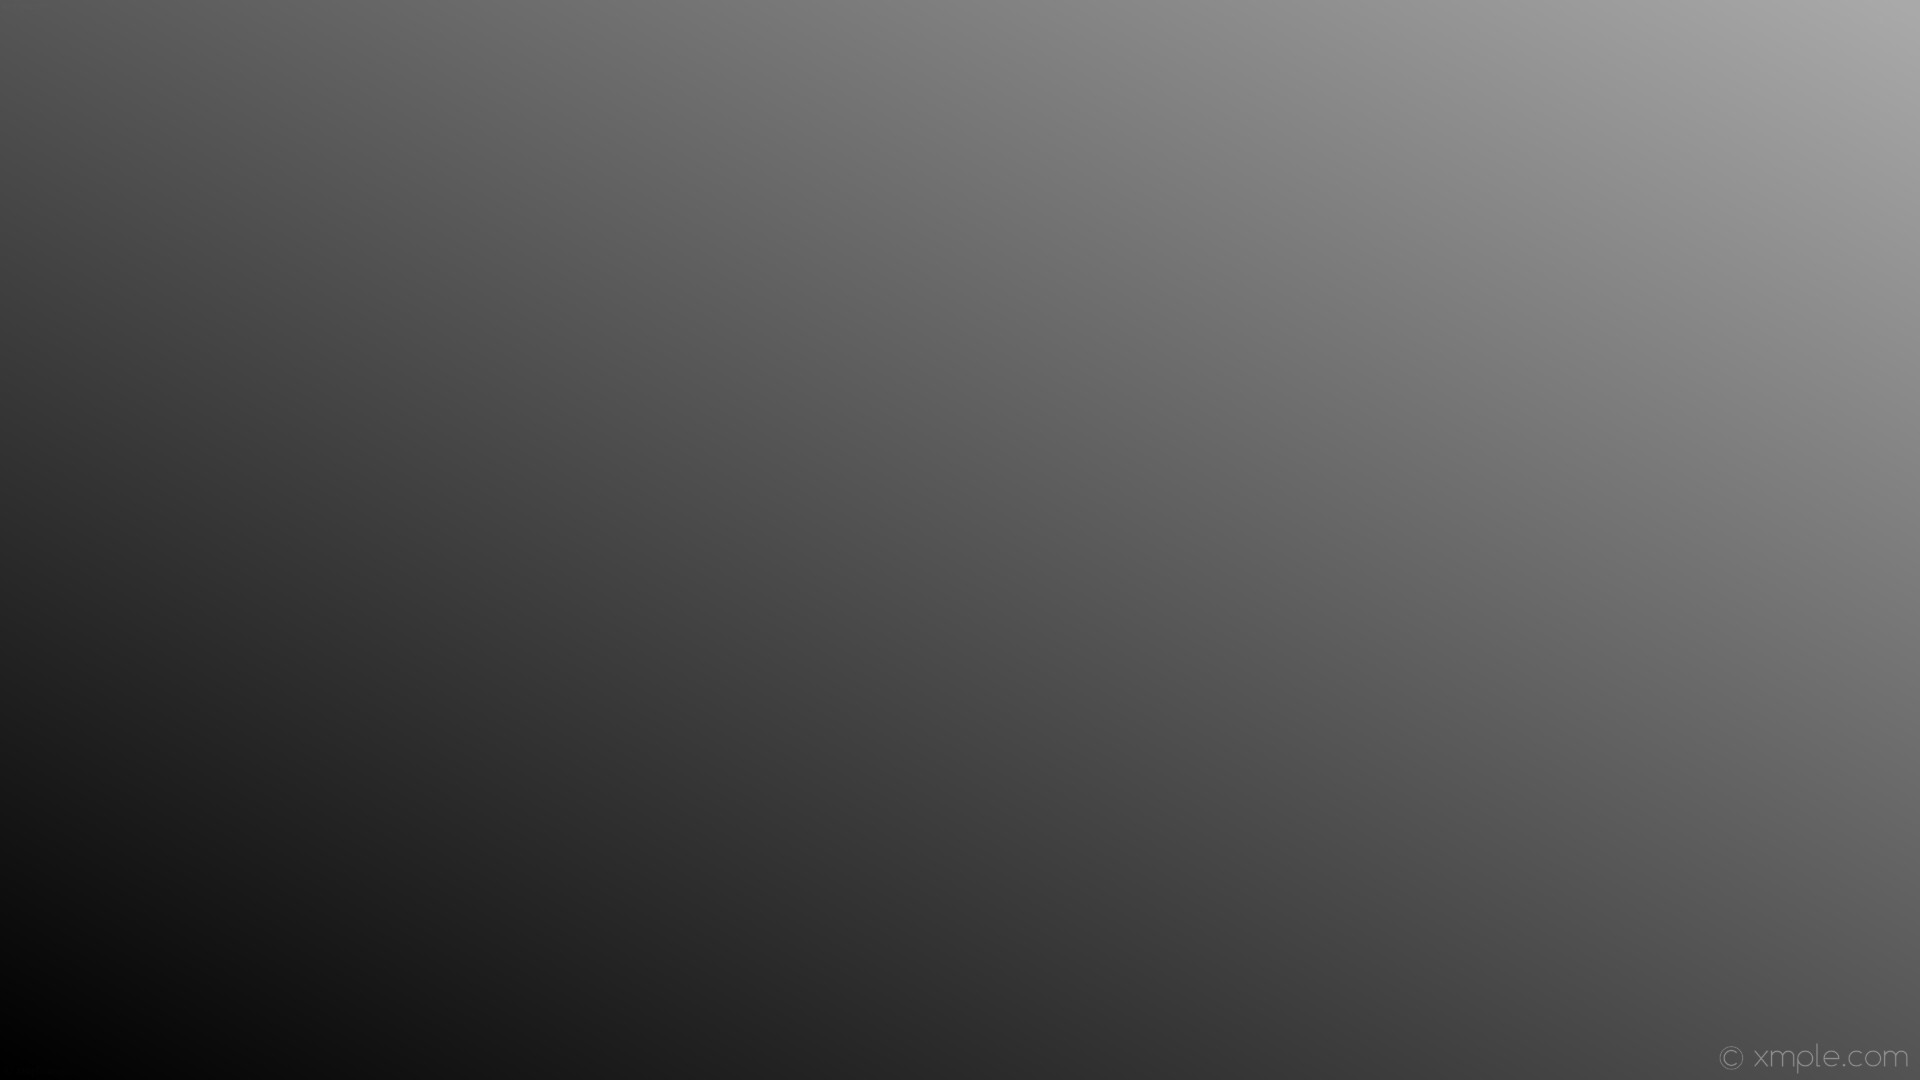 wallpaper grey black gradient linear dark gray #a9a9a9 #000000 30°